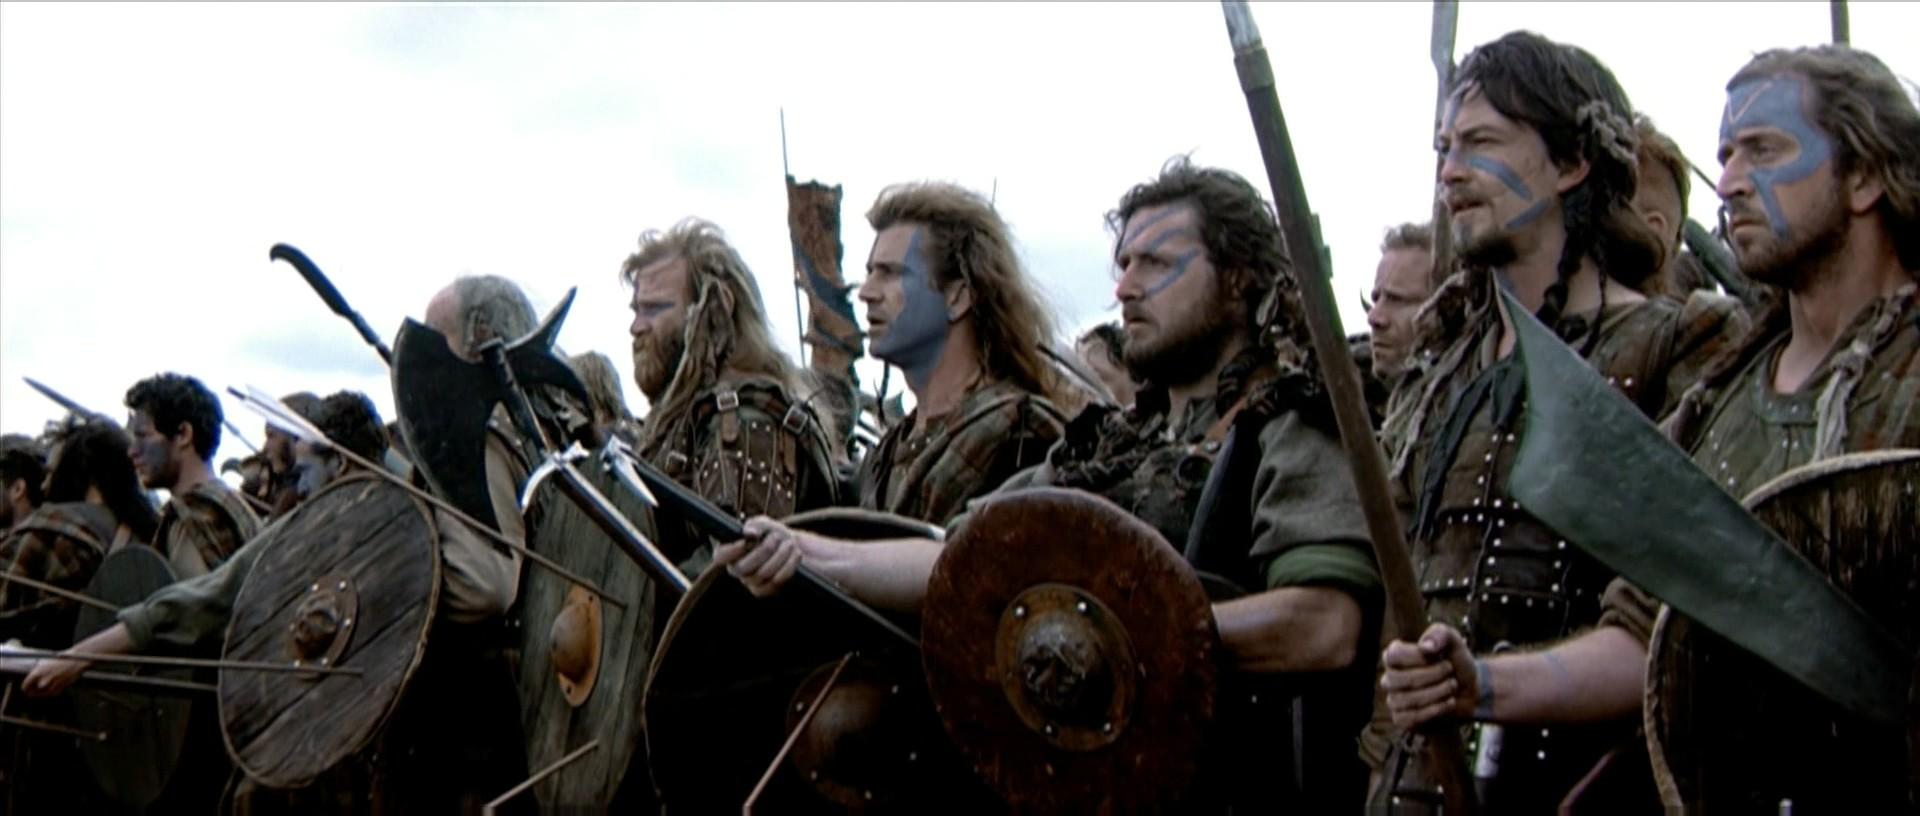 braveheart-film-guerriers-bataille.jpg